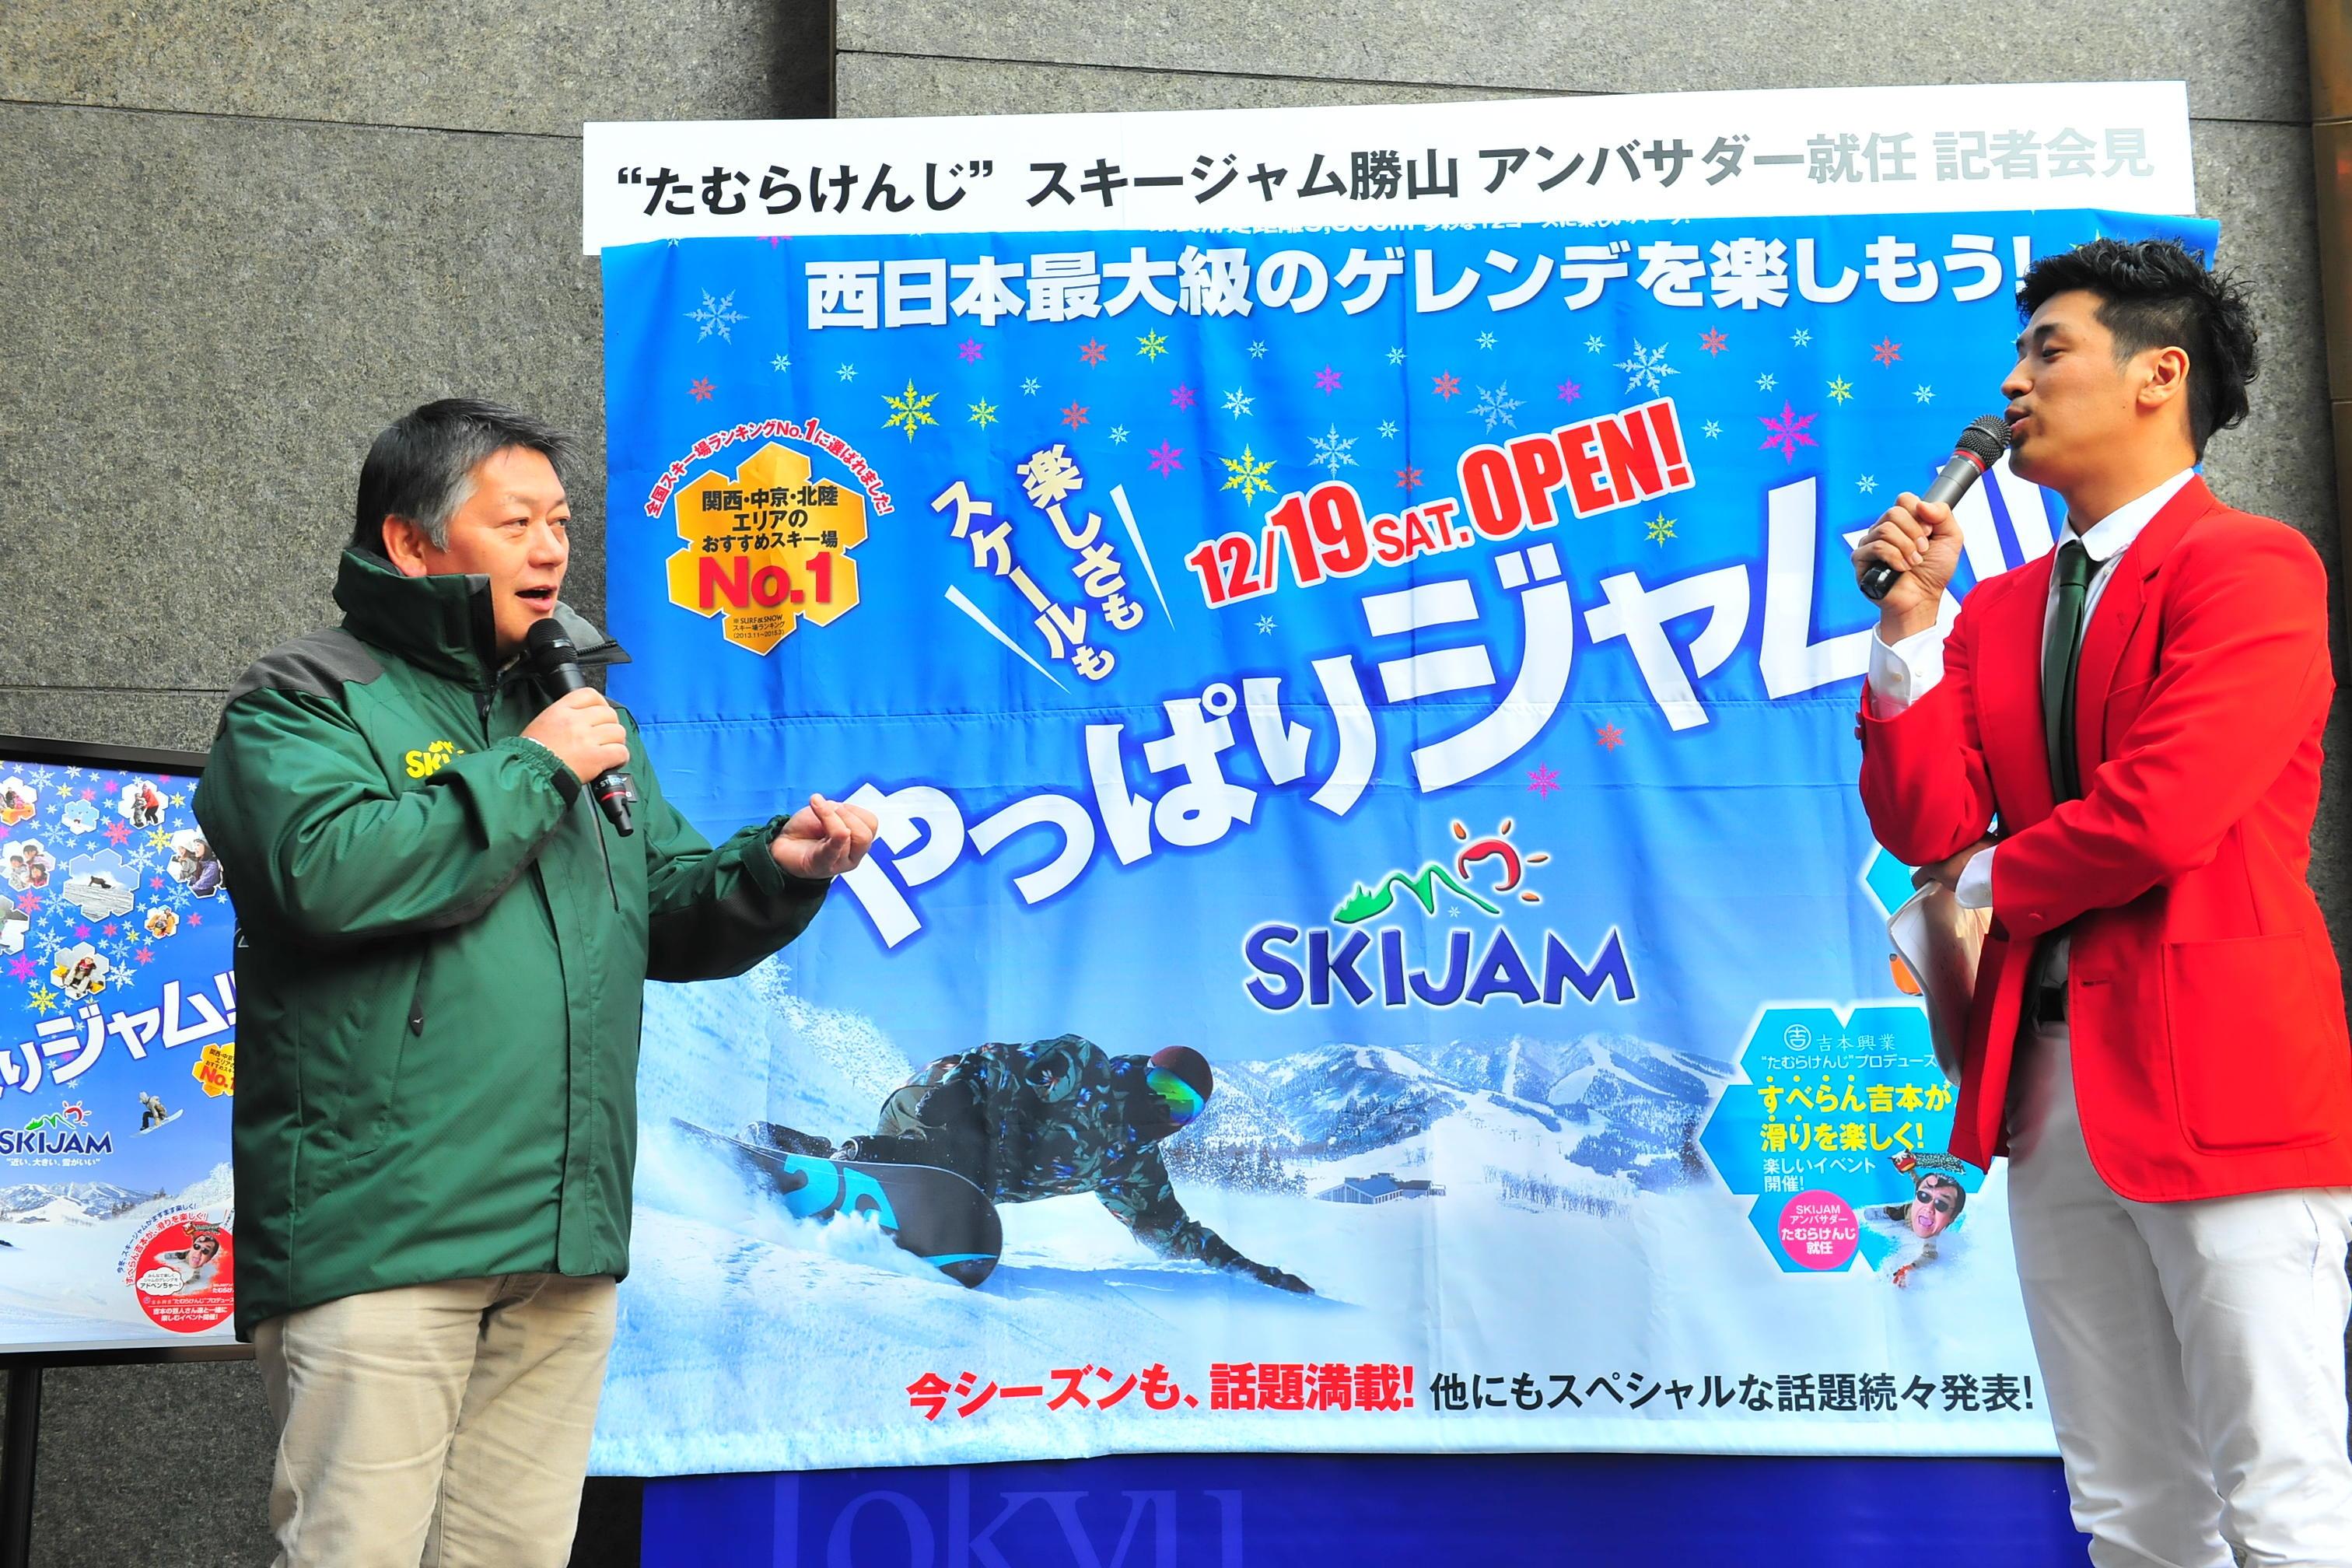 http://news.yoshimoto.co.jp/20151130194527-f10883393d2a6fc11b76b7bb8db8f224a742e40c.jpg